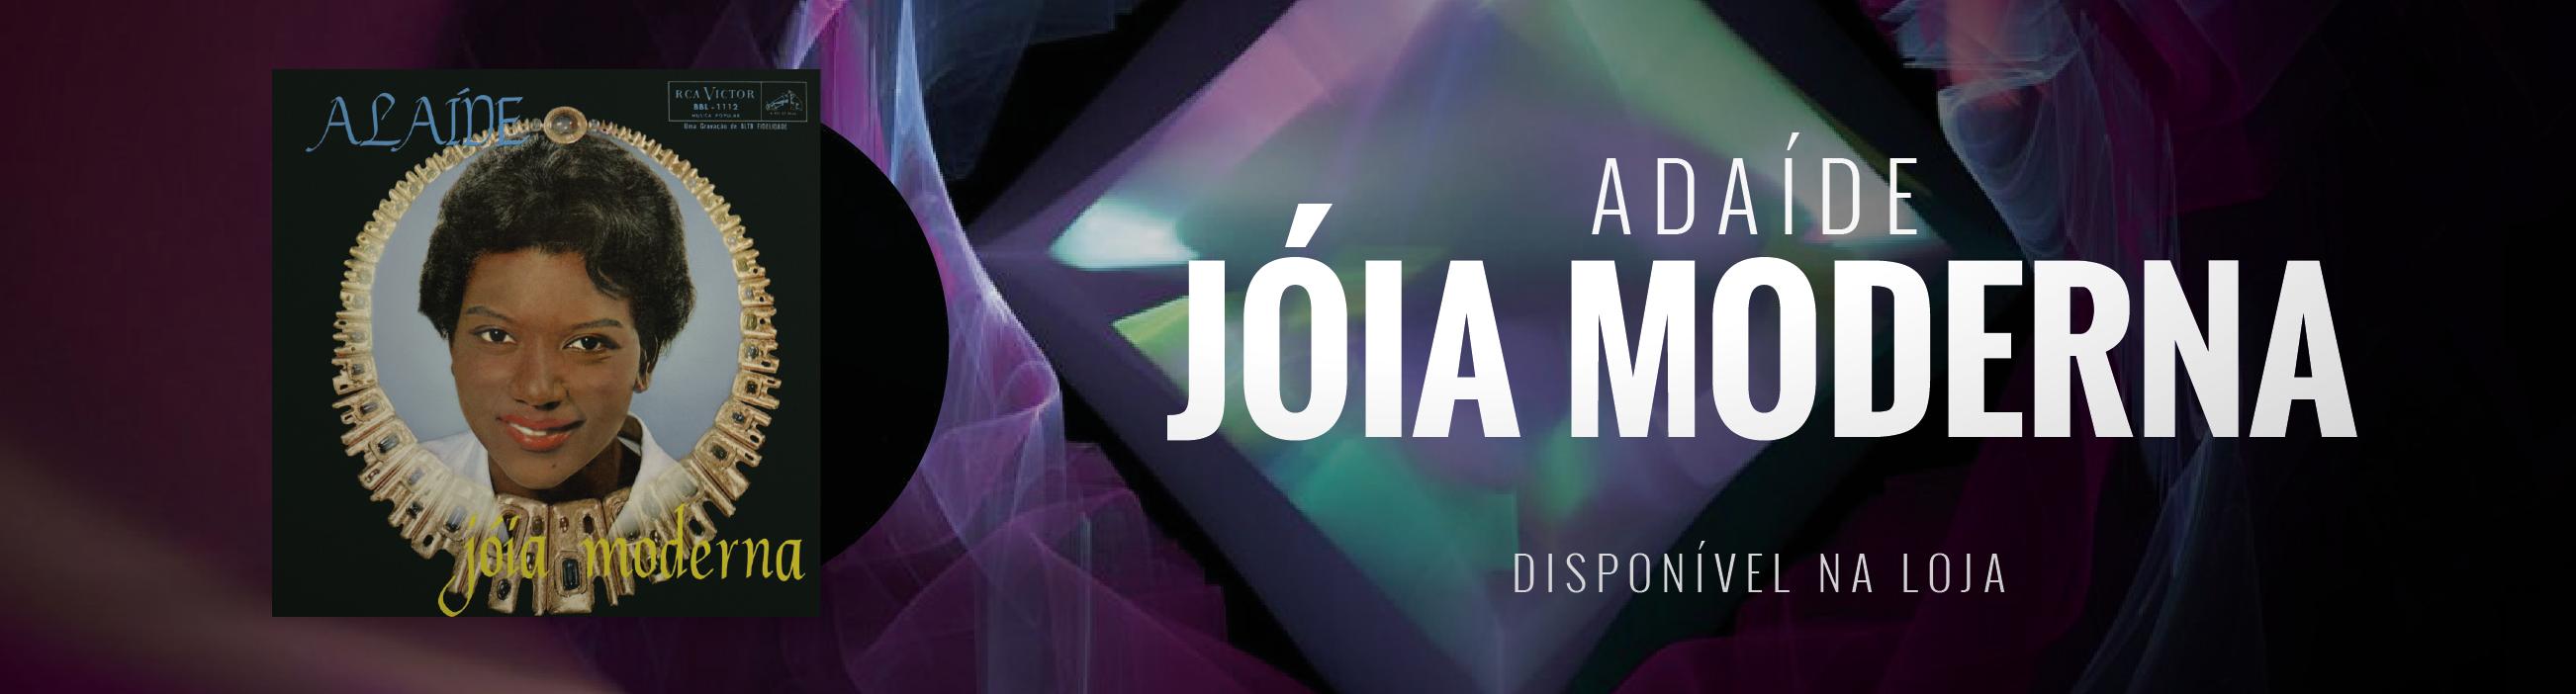 Lps Alaíde Costa - Jóia Moderna